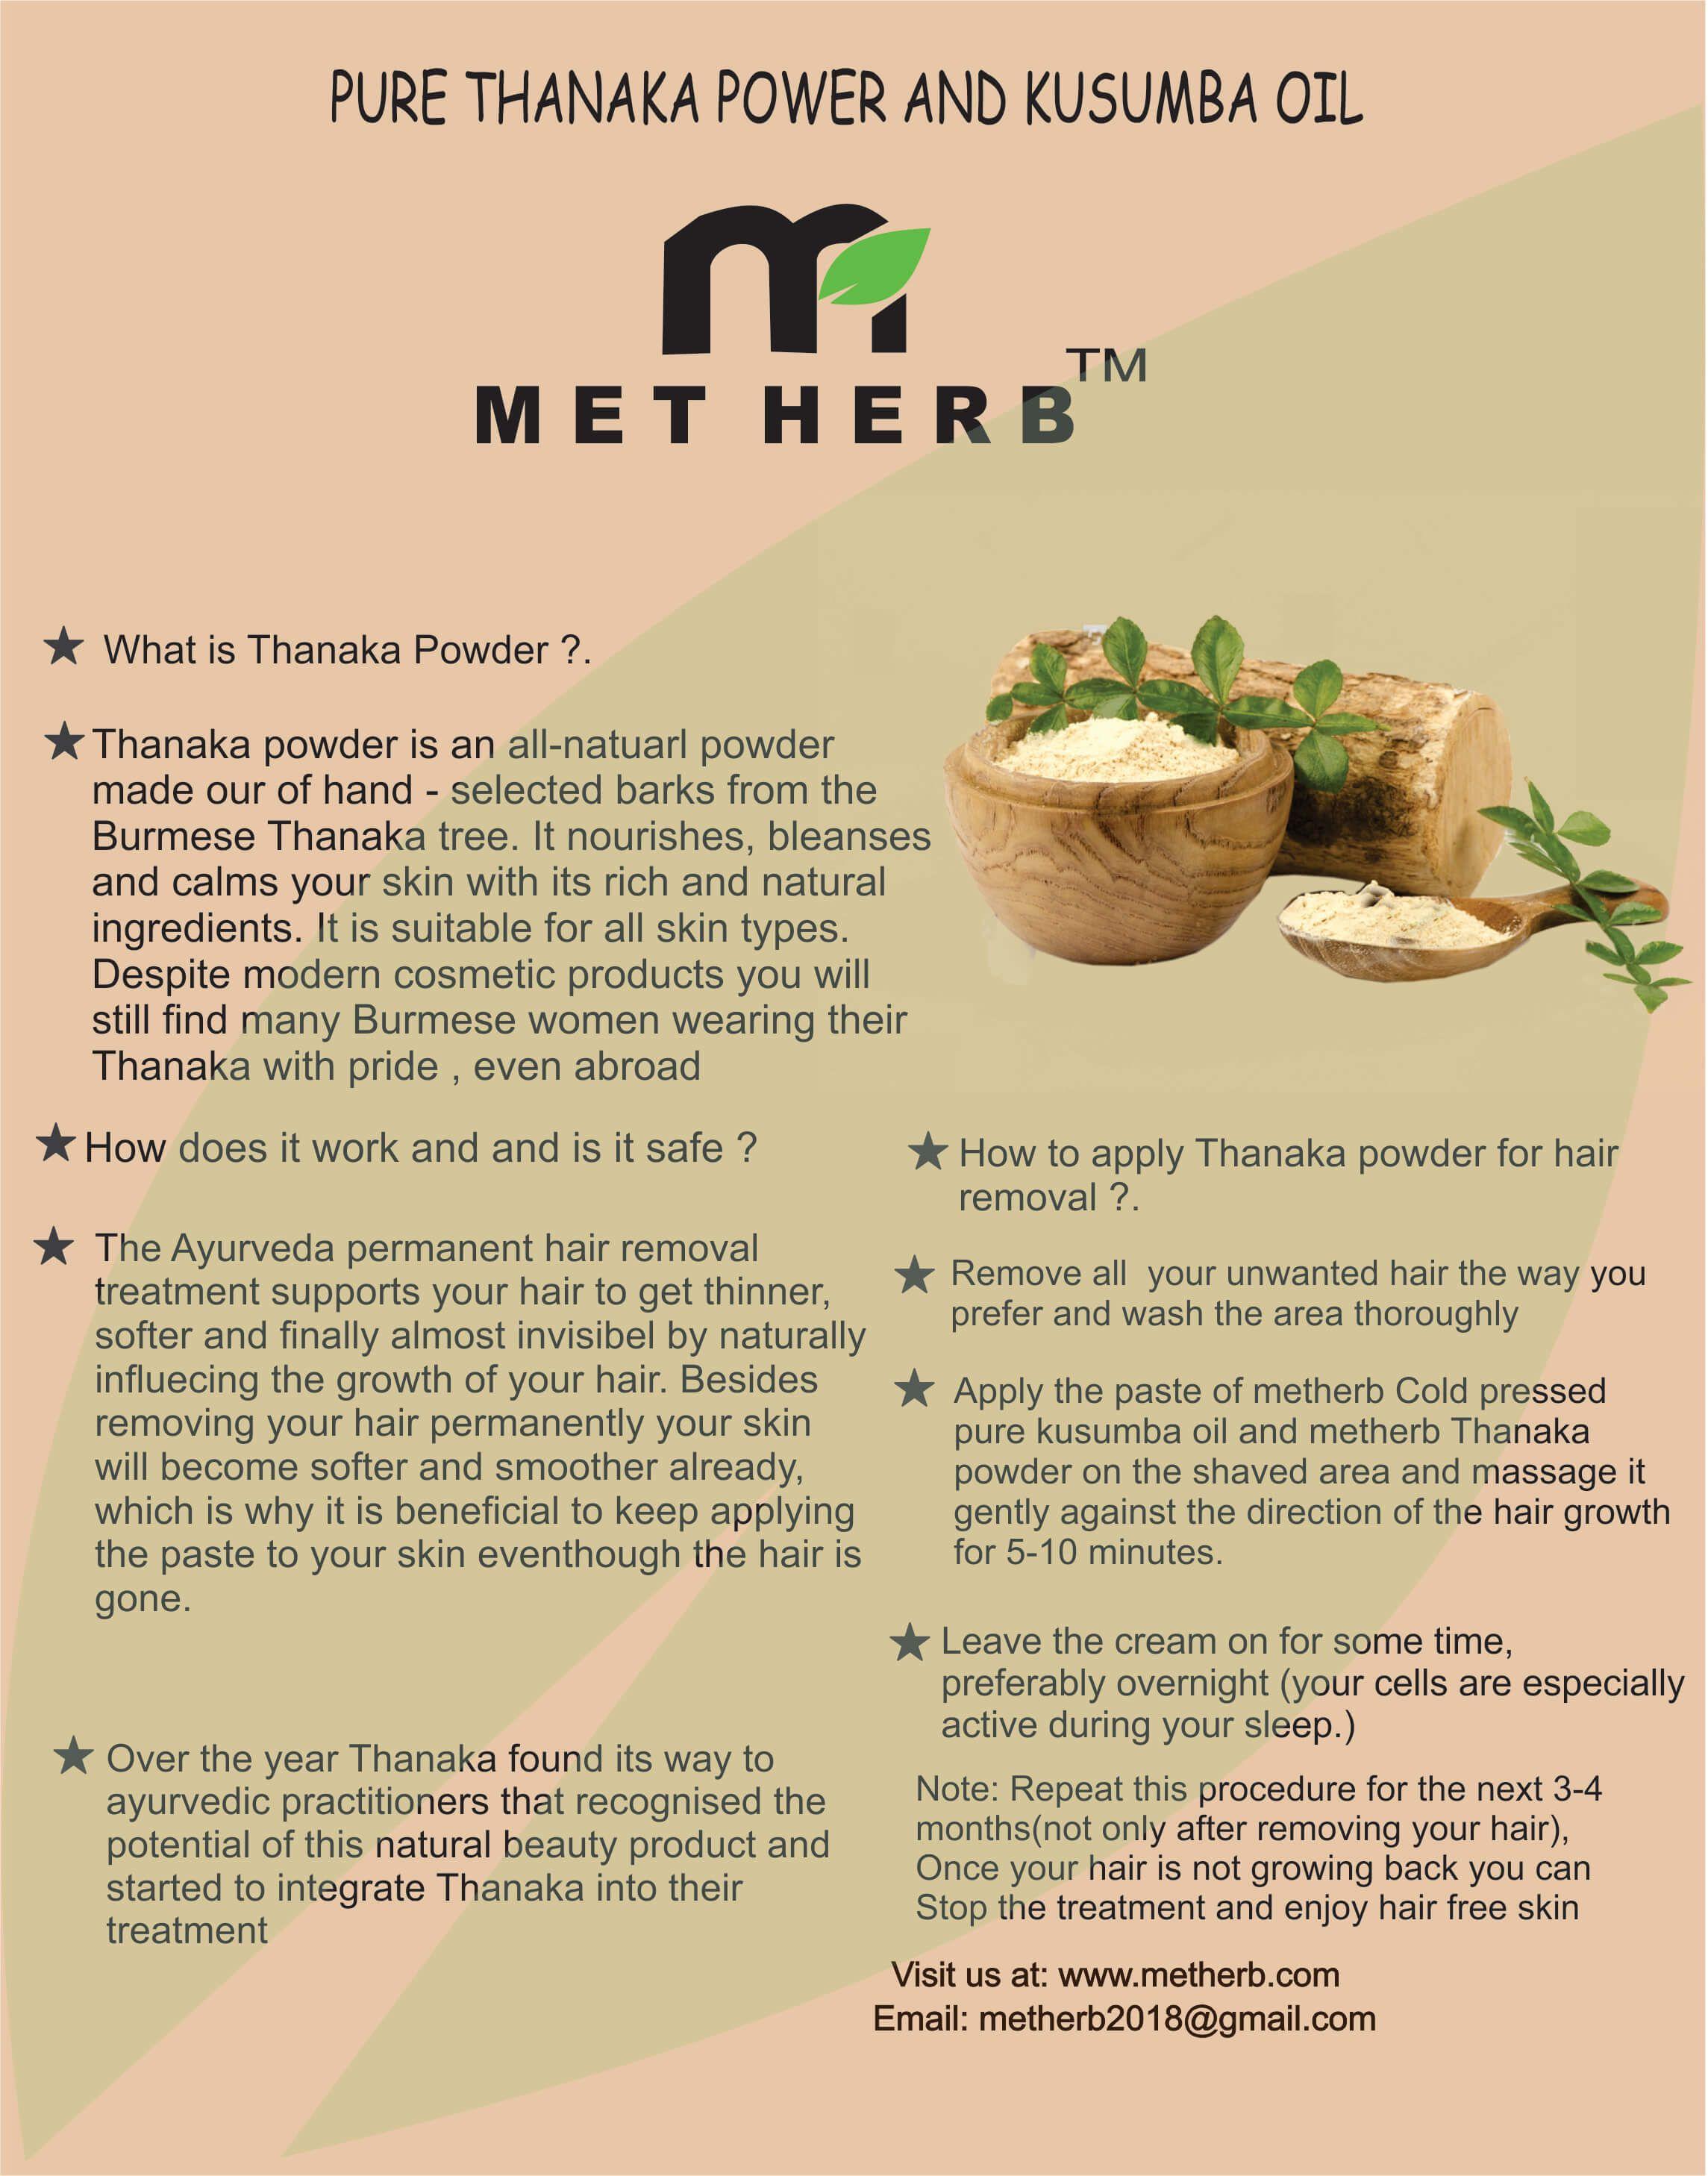 metherb Facial Kit Thanaka powder for hair removl 50 gm